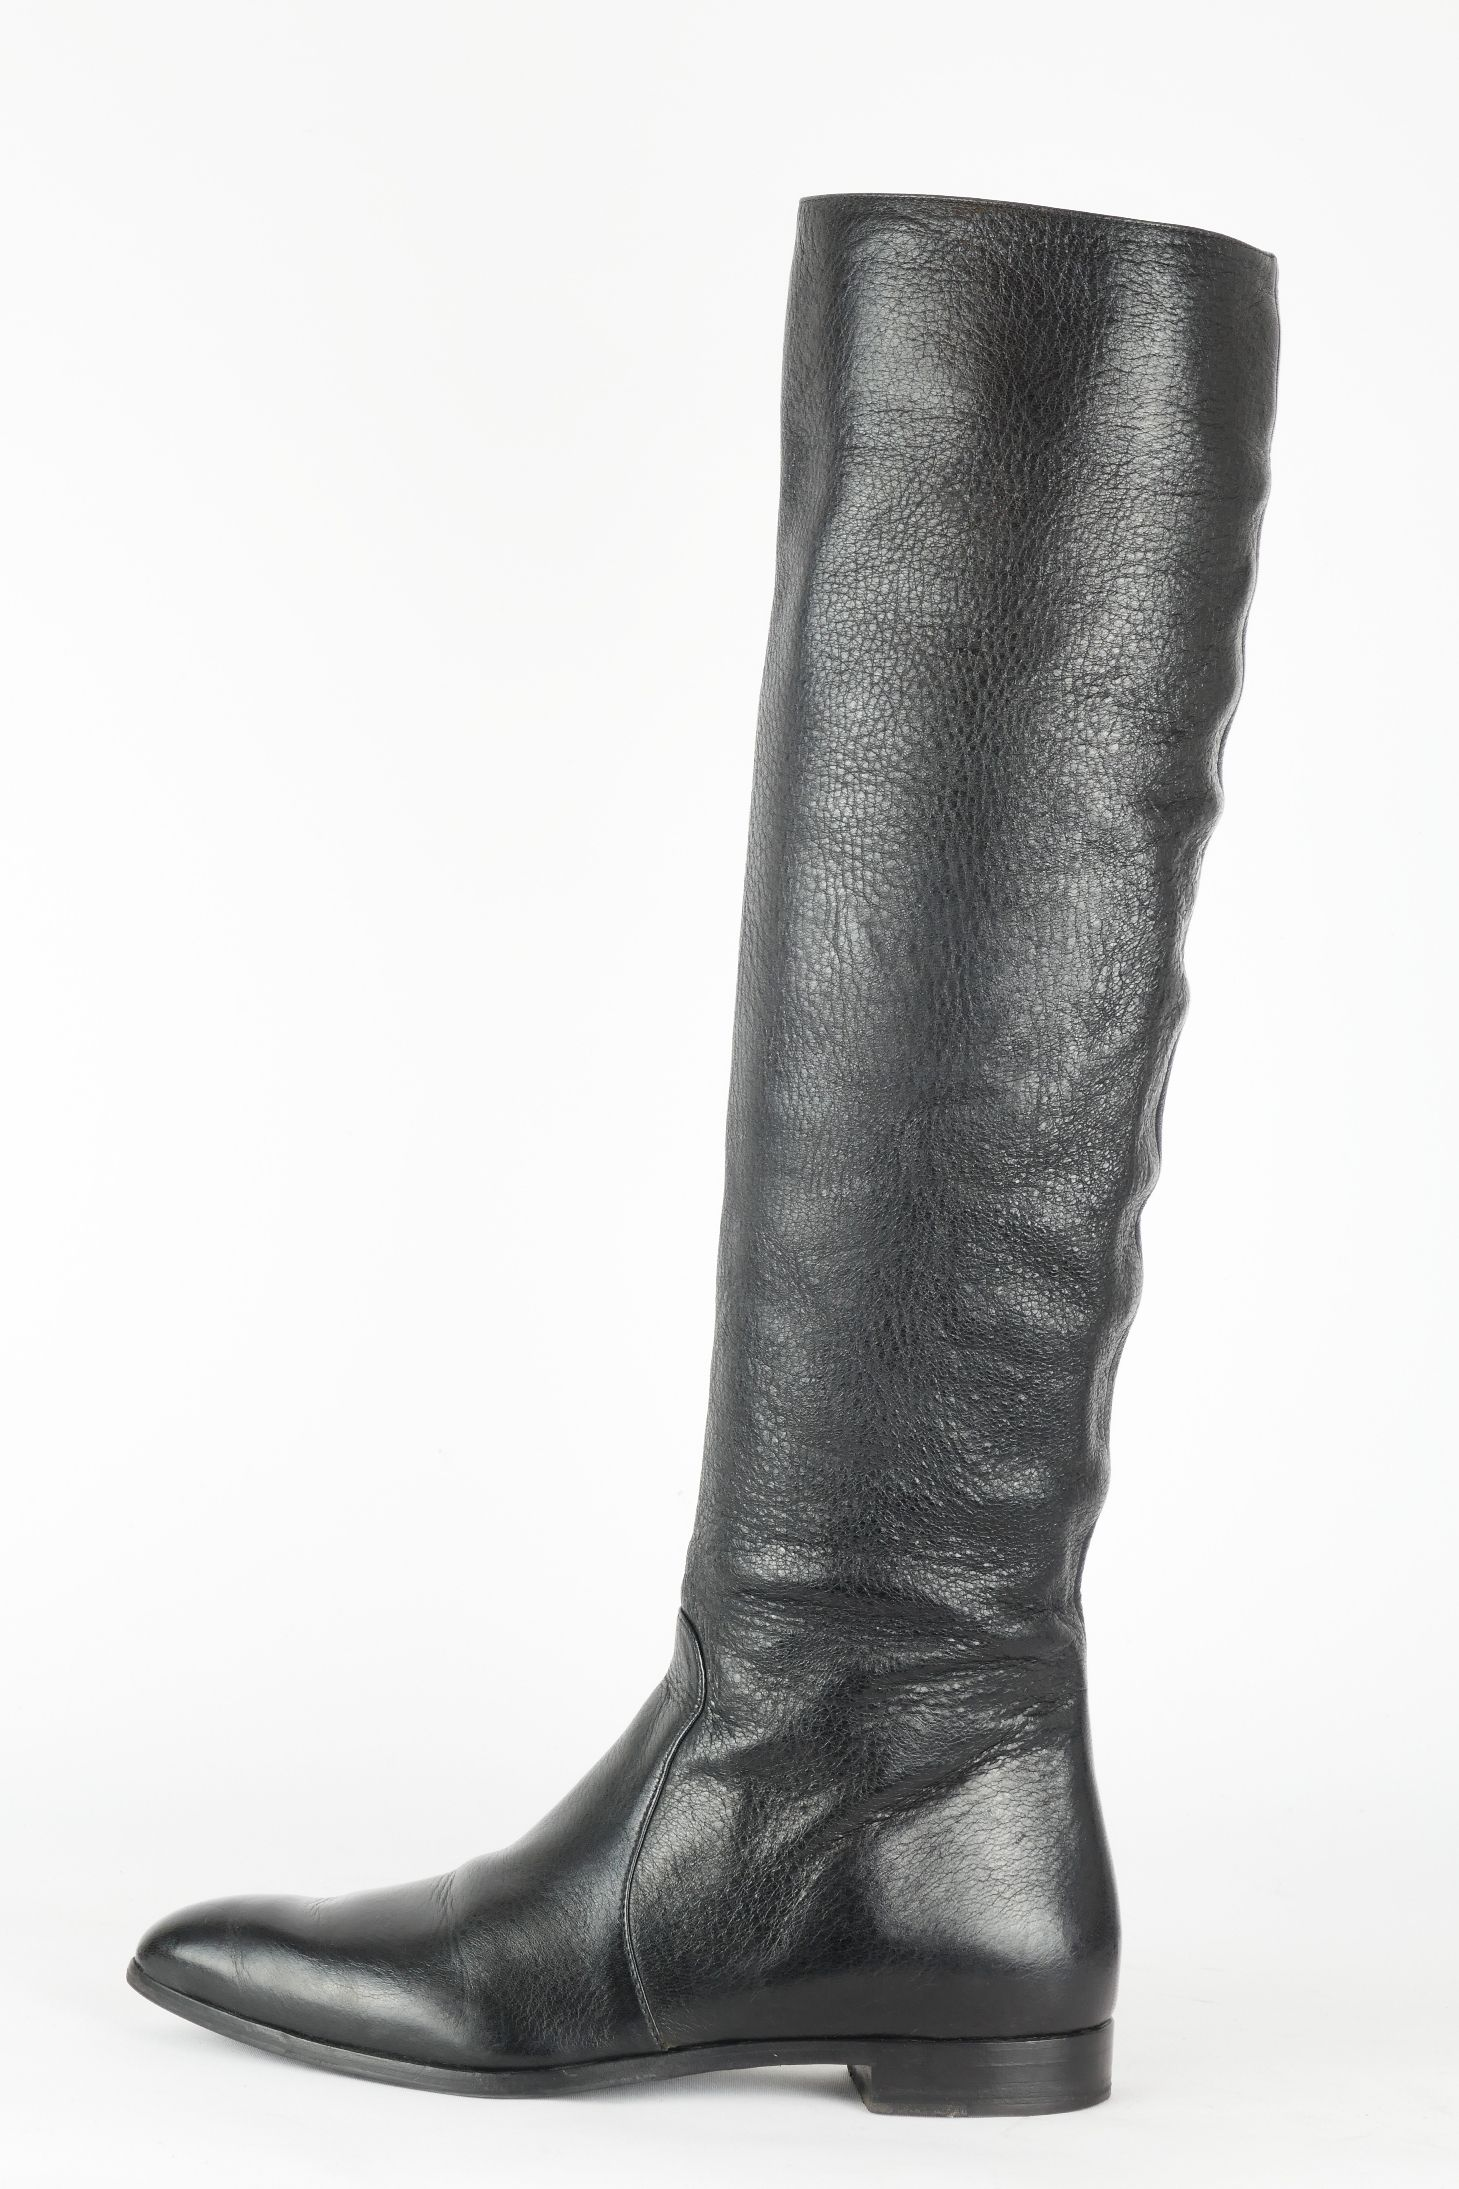 neues Erscheinungsbild Outlet zum Verkauf kinder Prada Overknees Leder schwarz | 00 BUUTS Overknee-Outlet ...